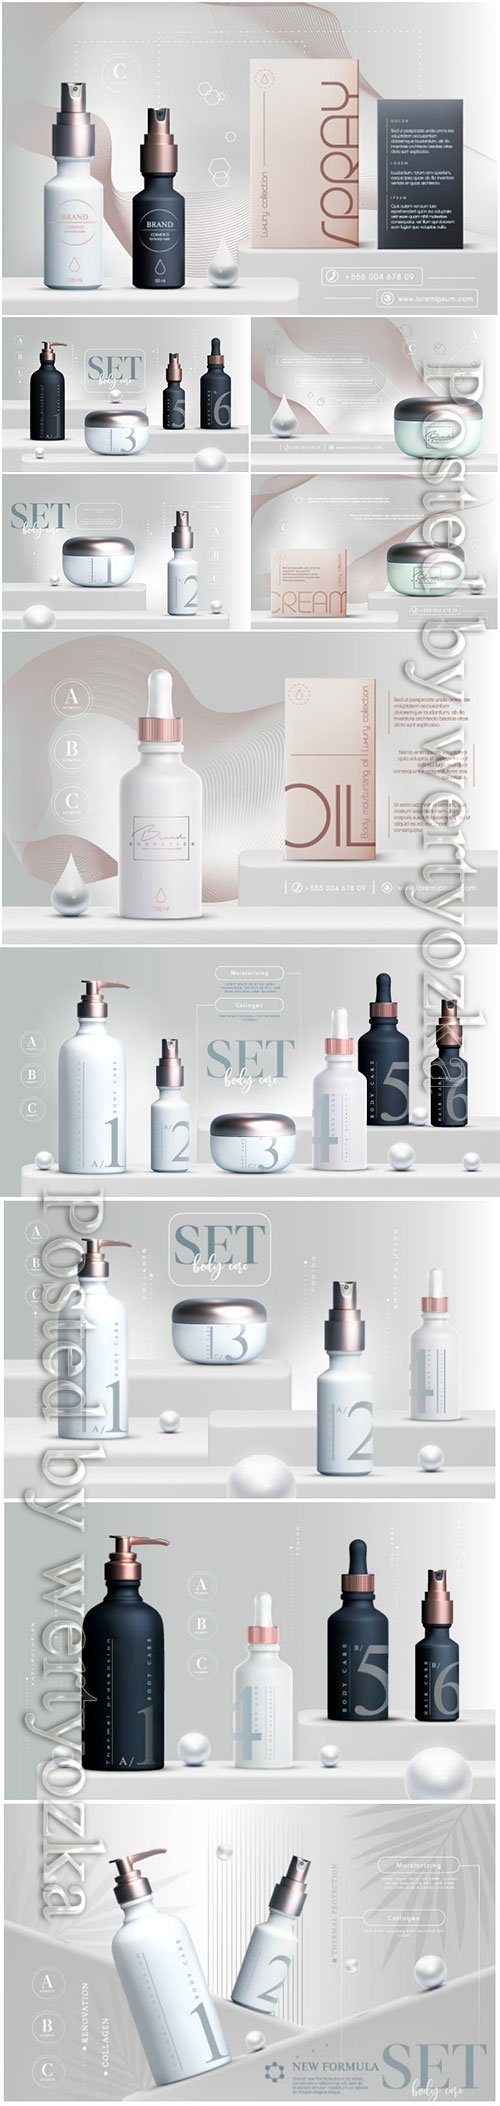 Vector 3D elegant cosmetic products set vector illustration